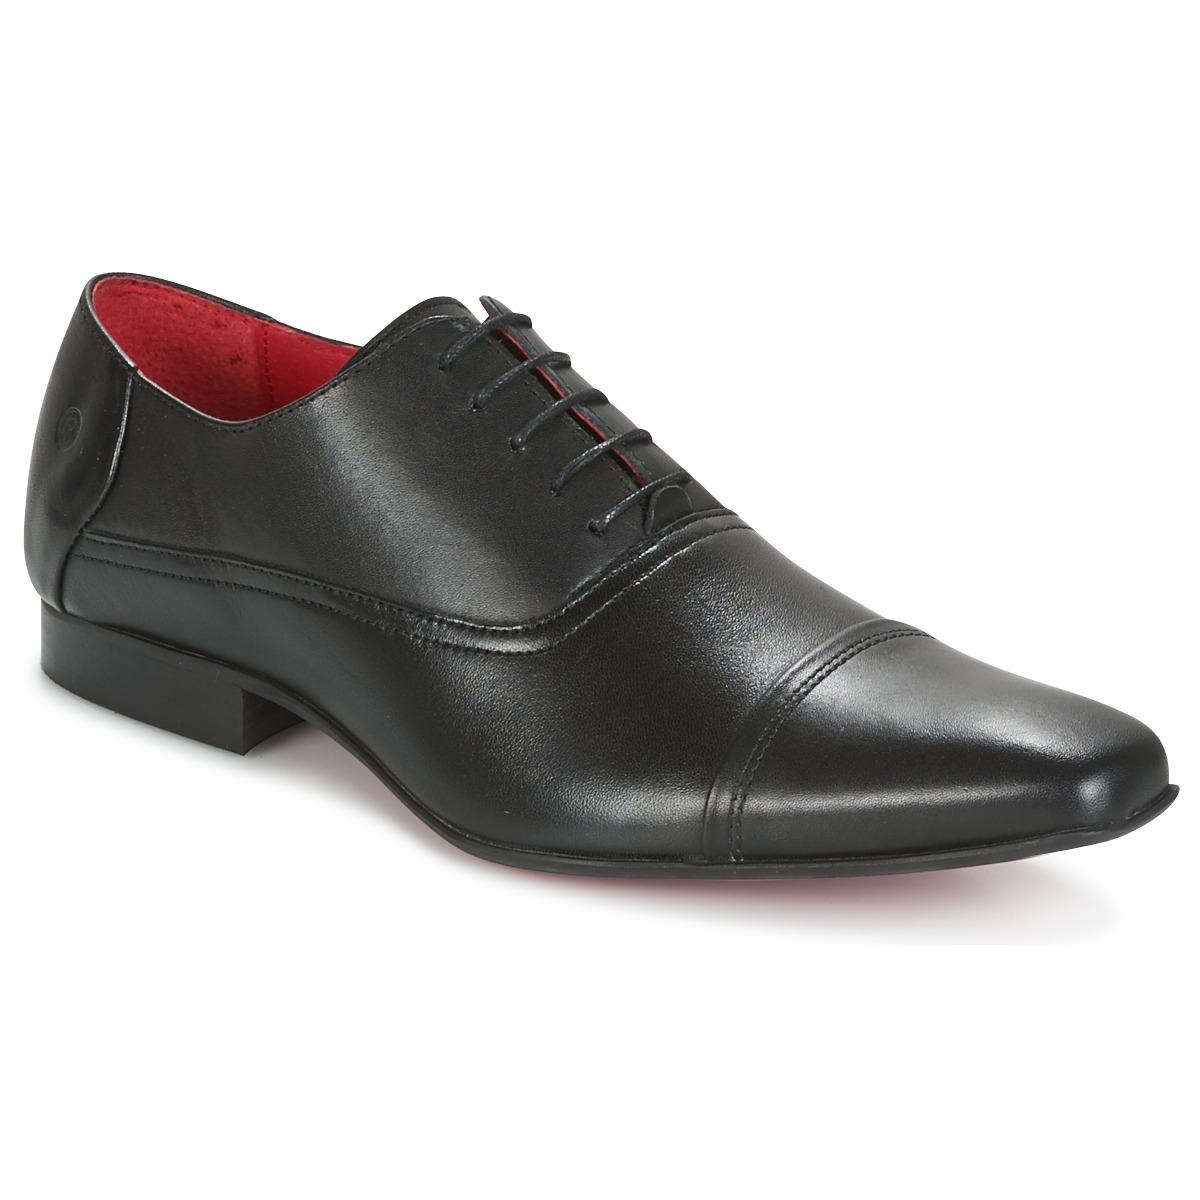 Snerovaci spolecenska obuv Carlington ITIPIQ Černá